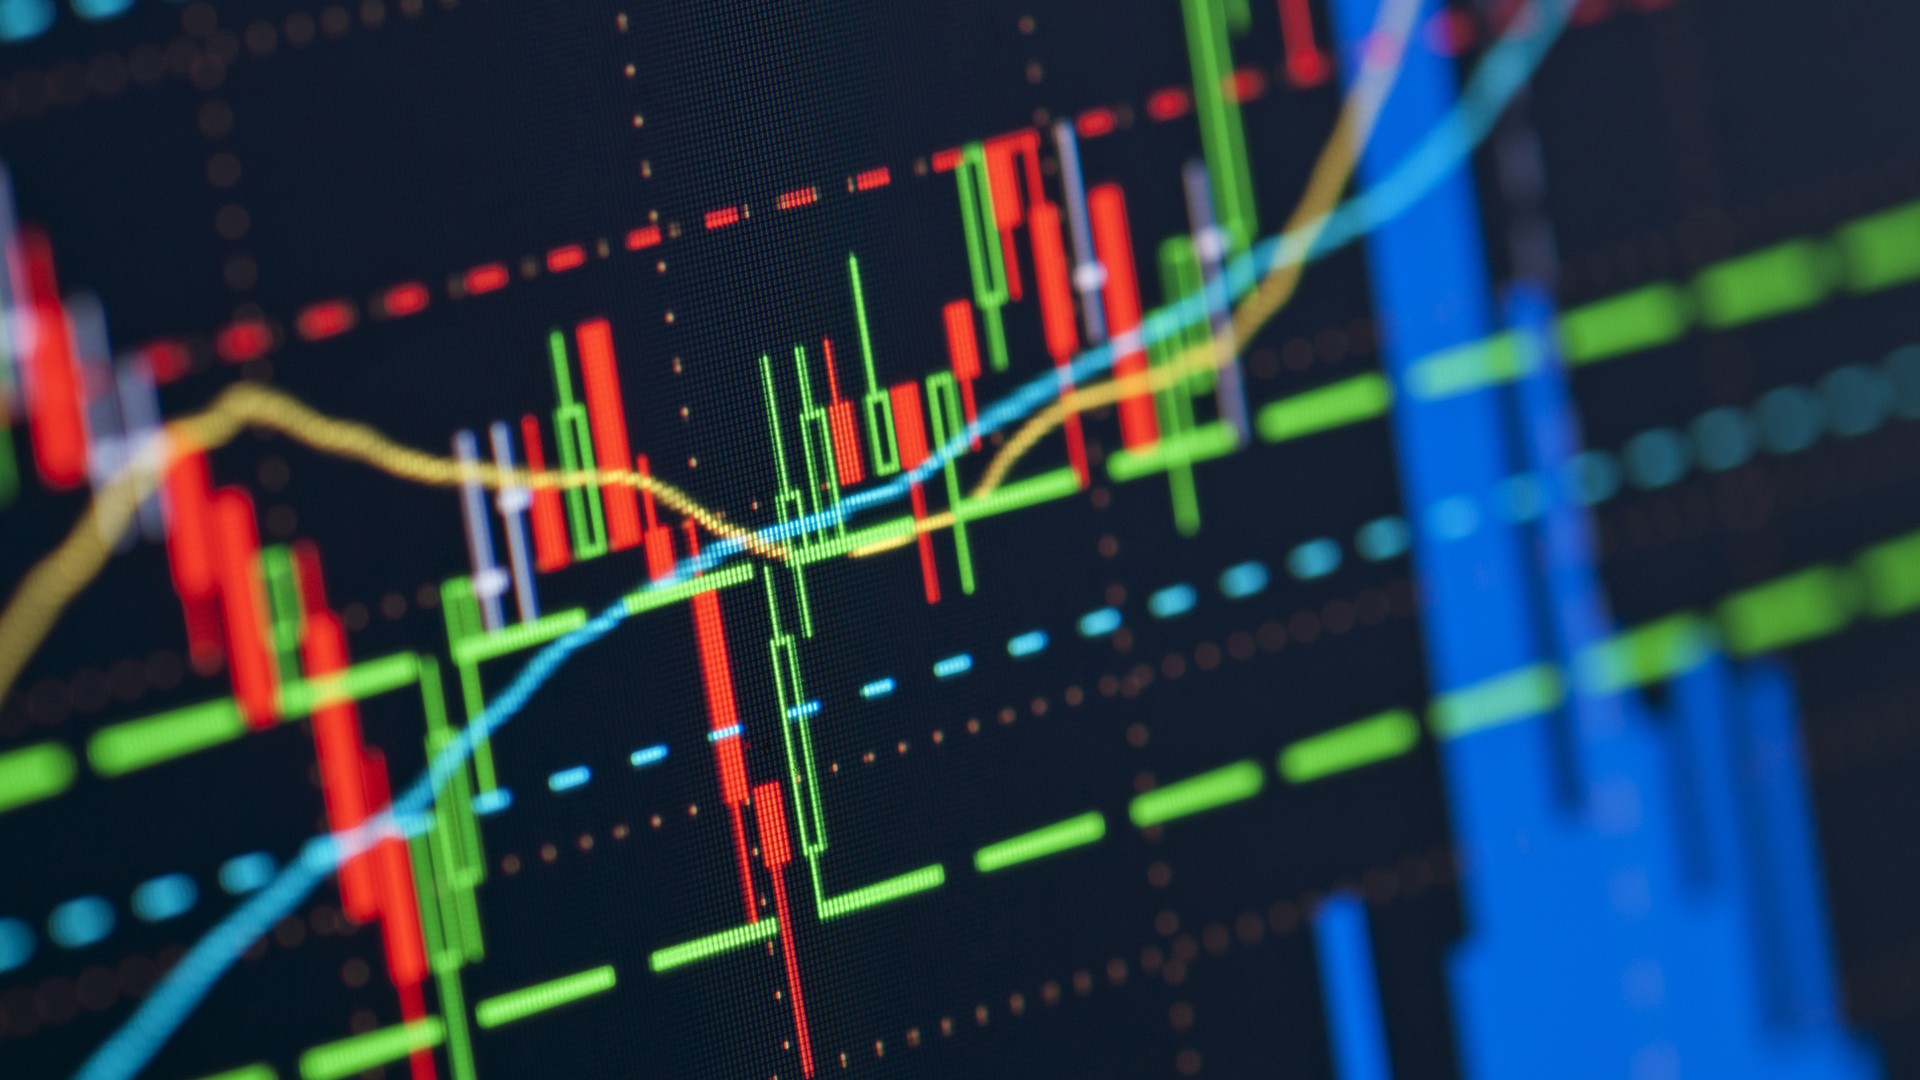 binance coin bnb fiyat analizi yeniden guc kazandi onemli seviyeler neler